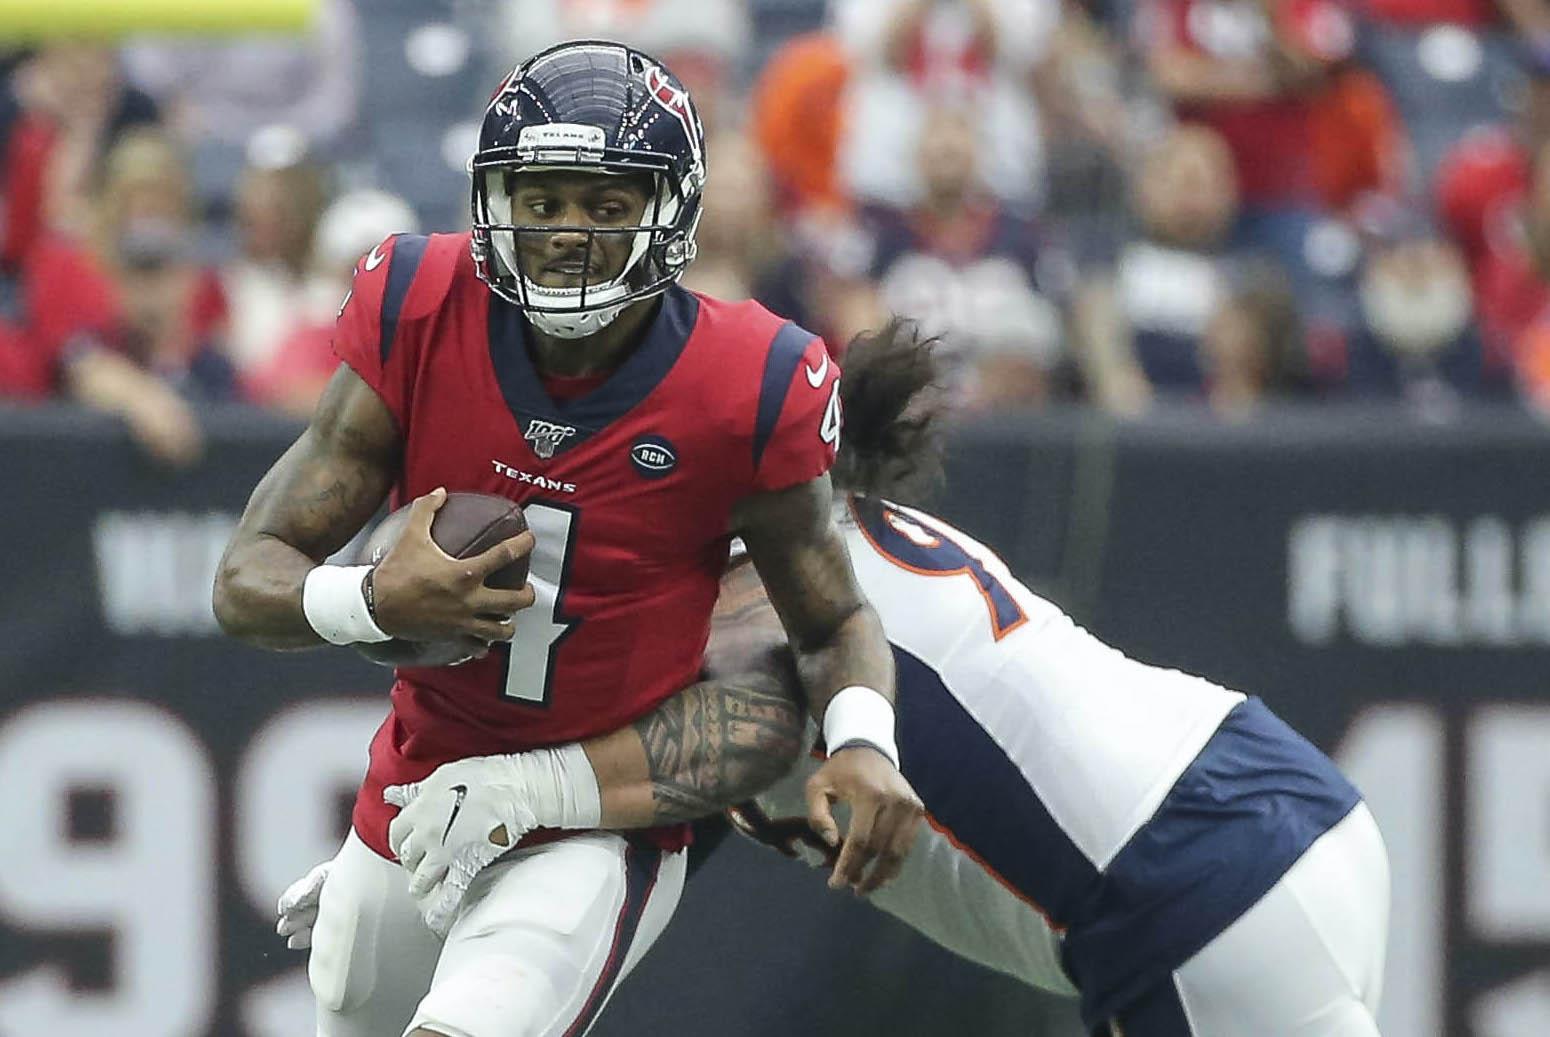 Broncos' Defense Shut Down Deshaun Watson and The Texans' Big-Play Ability